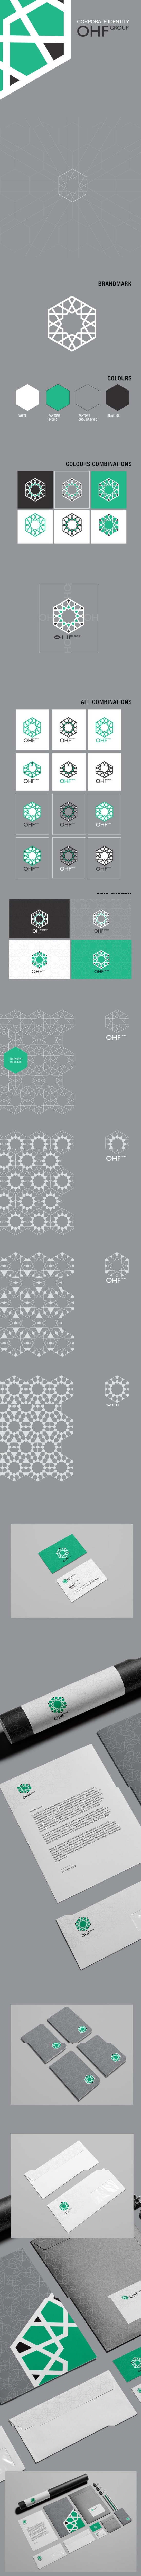 OHF Aarbic branding